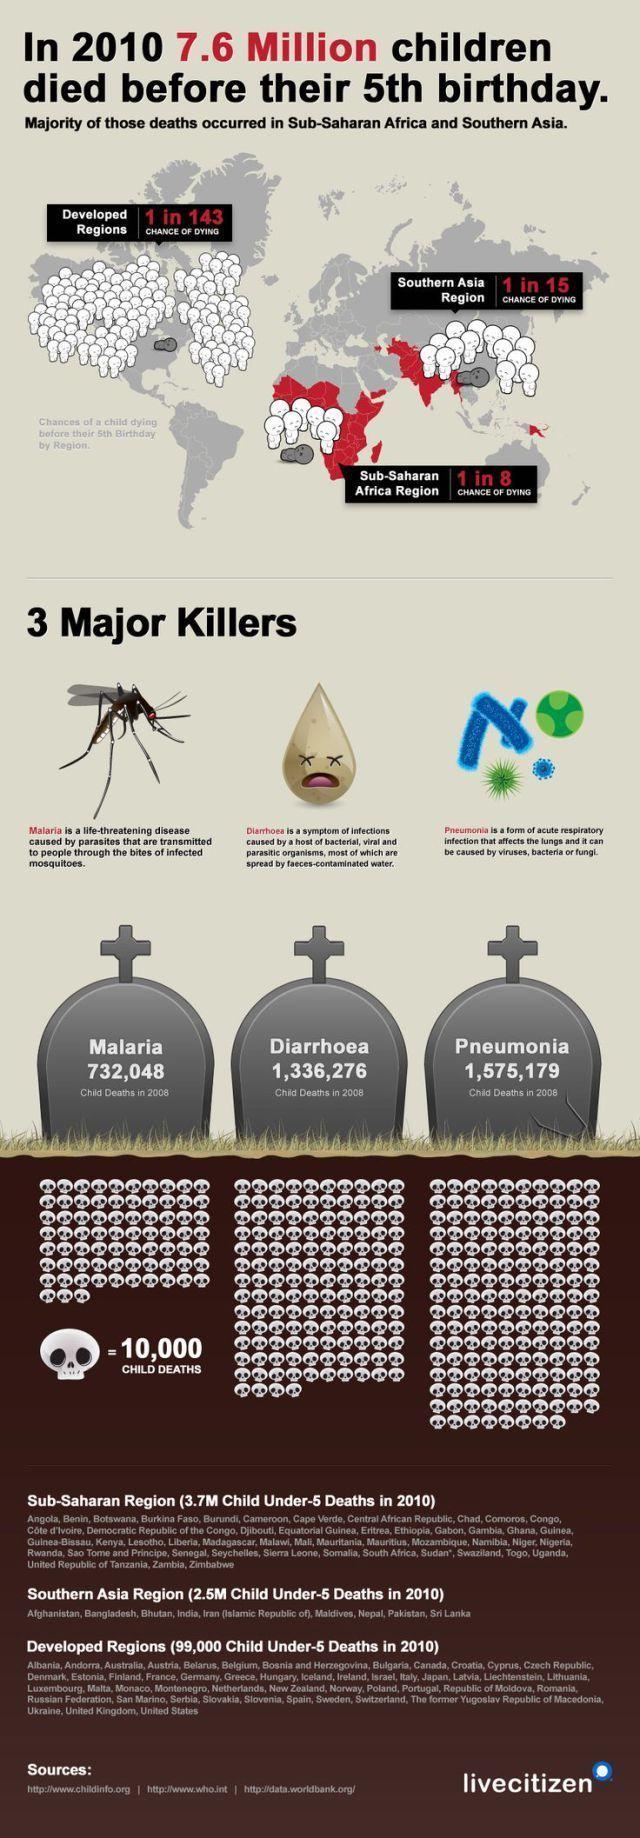 fundraising infographic : fundraising infographic : fundraising infographic : Child Mortality Under-5 by R…